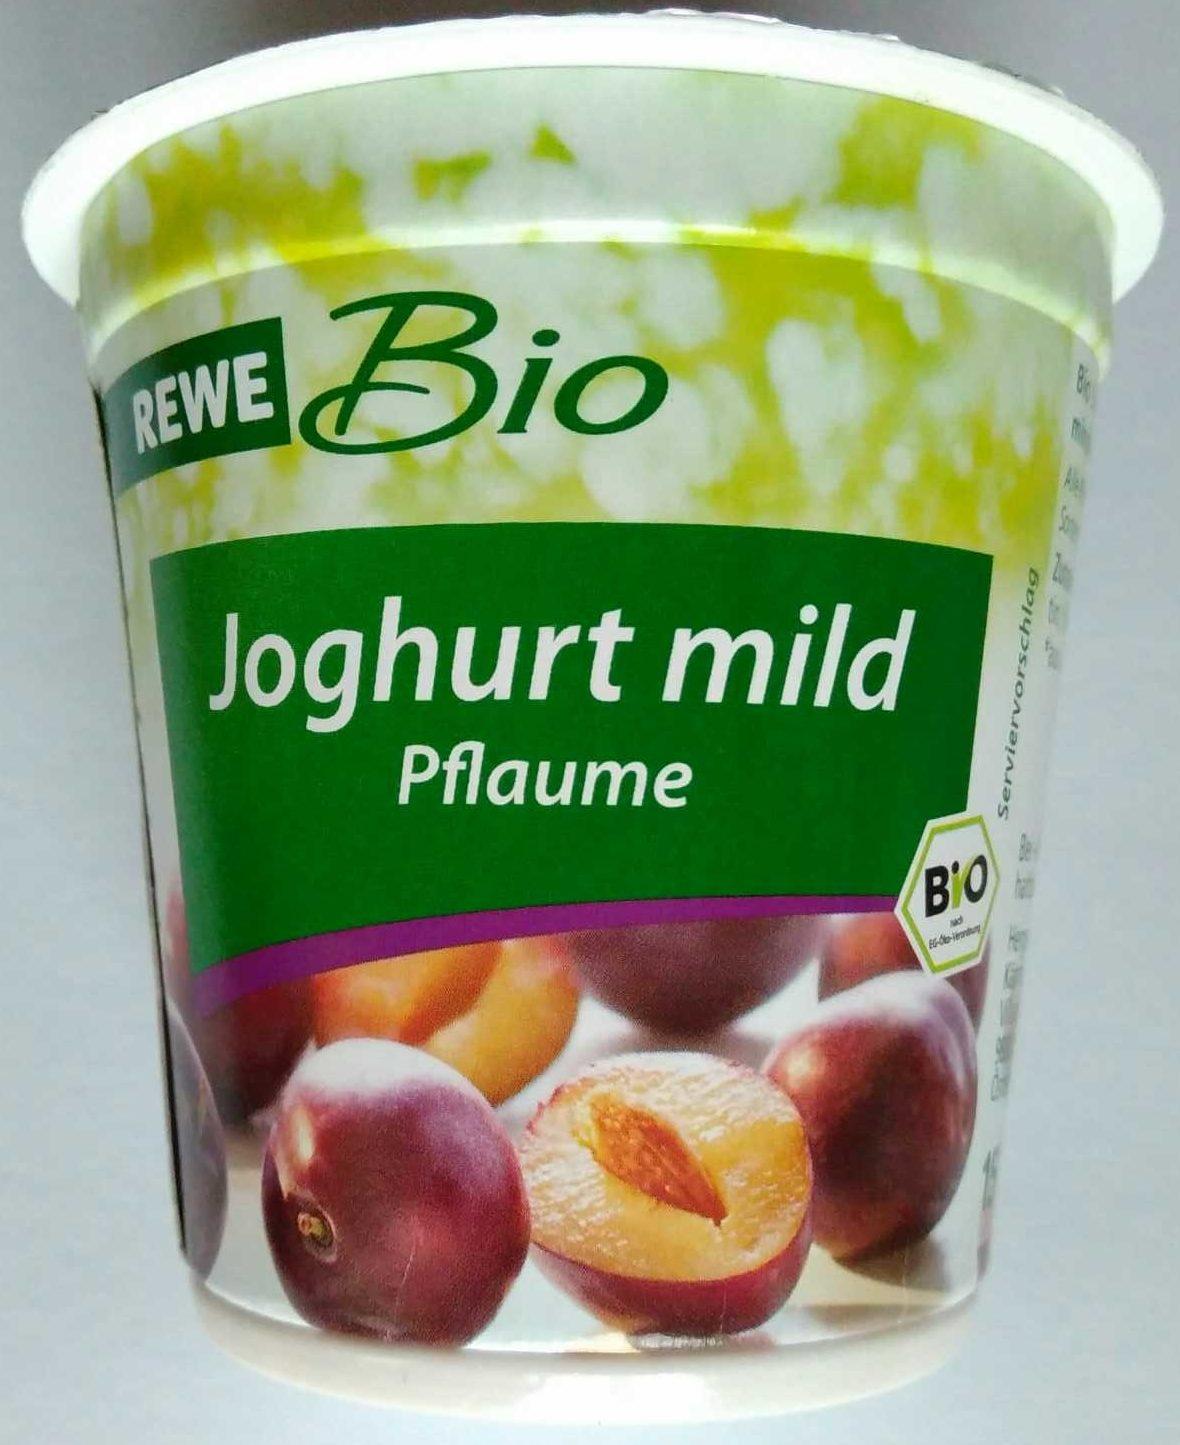 Joghurt mild Pflaume - Product - de